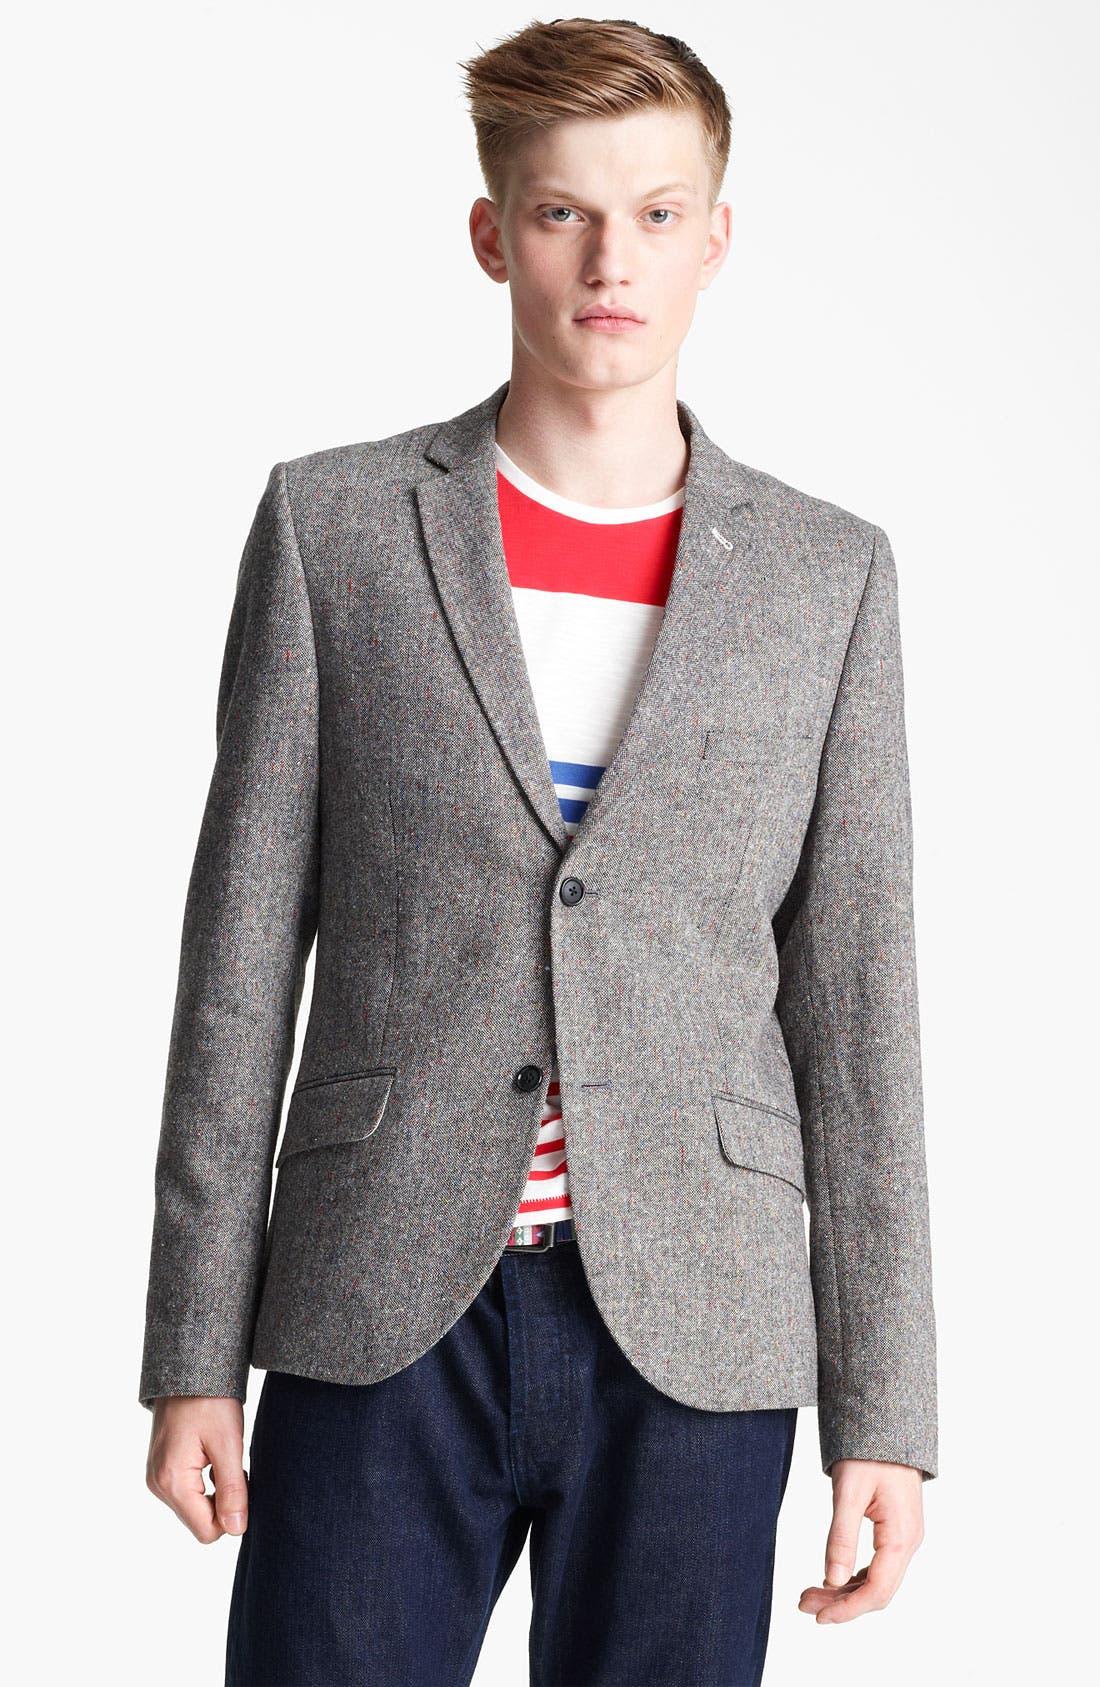 Alternate Image 1 Selected - Topman Heritage Fit Multi Fleck Blazer